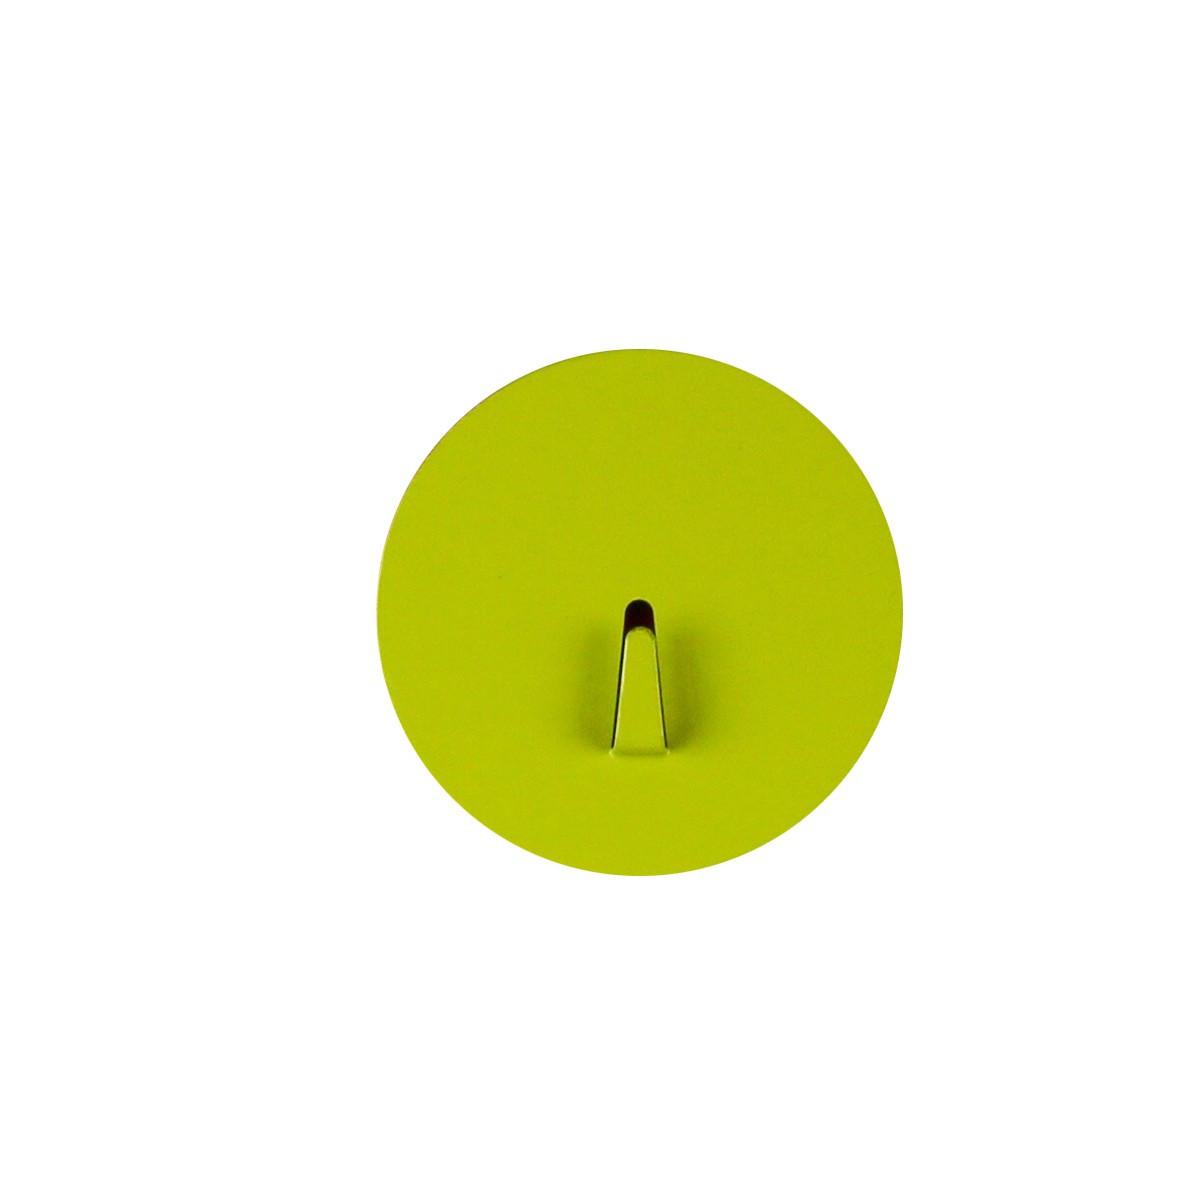 crochet aimant rond vert rangement cl s. Black Bedroom Furniture Sets. Home Design Ideas